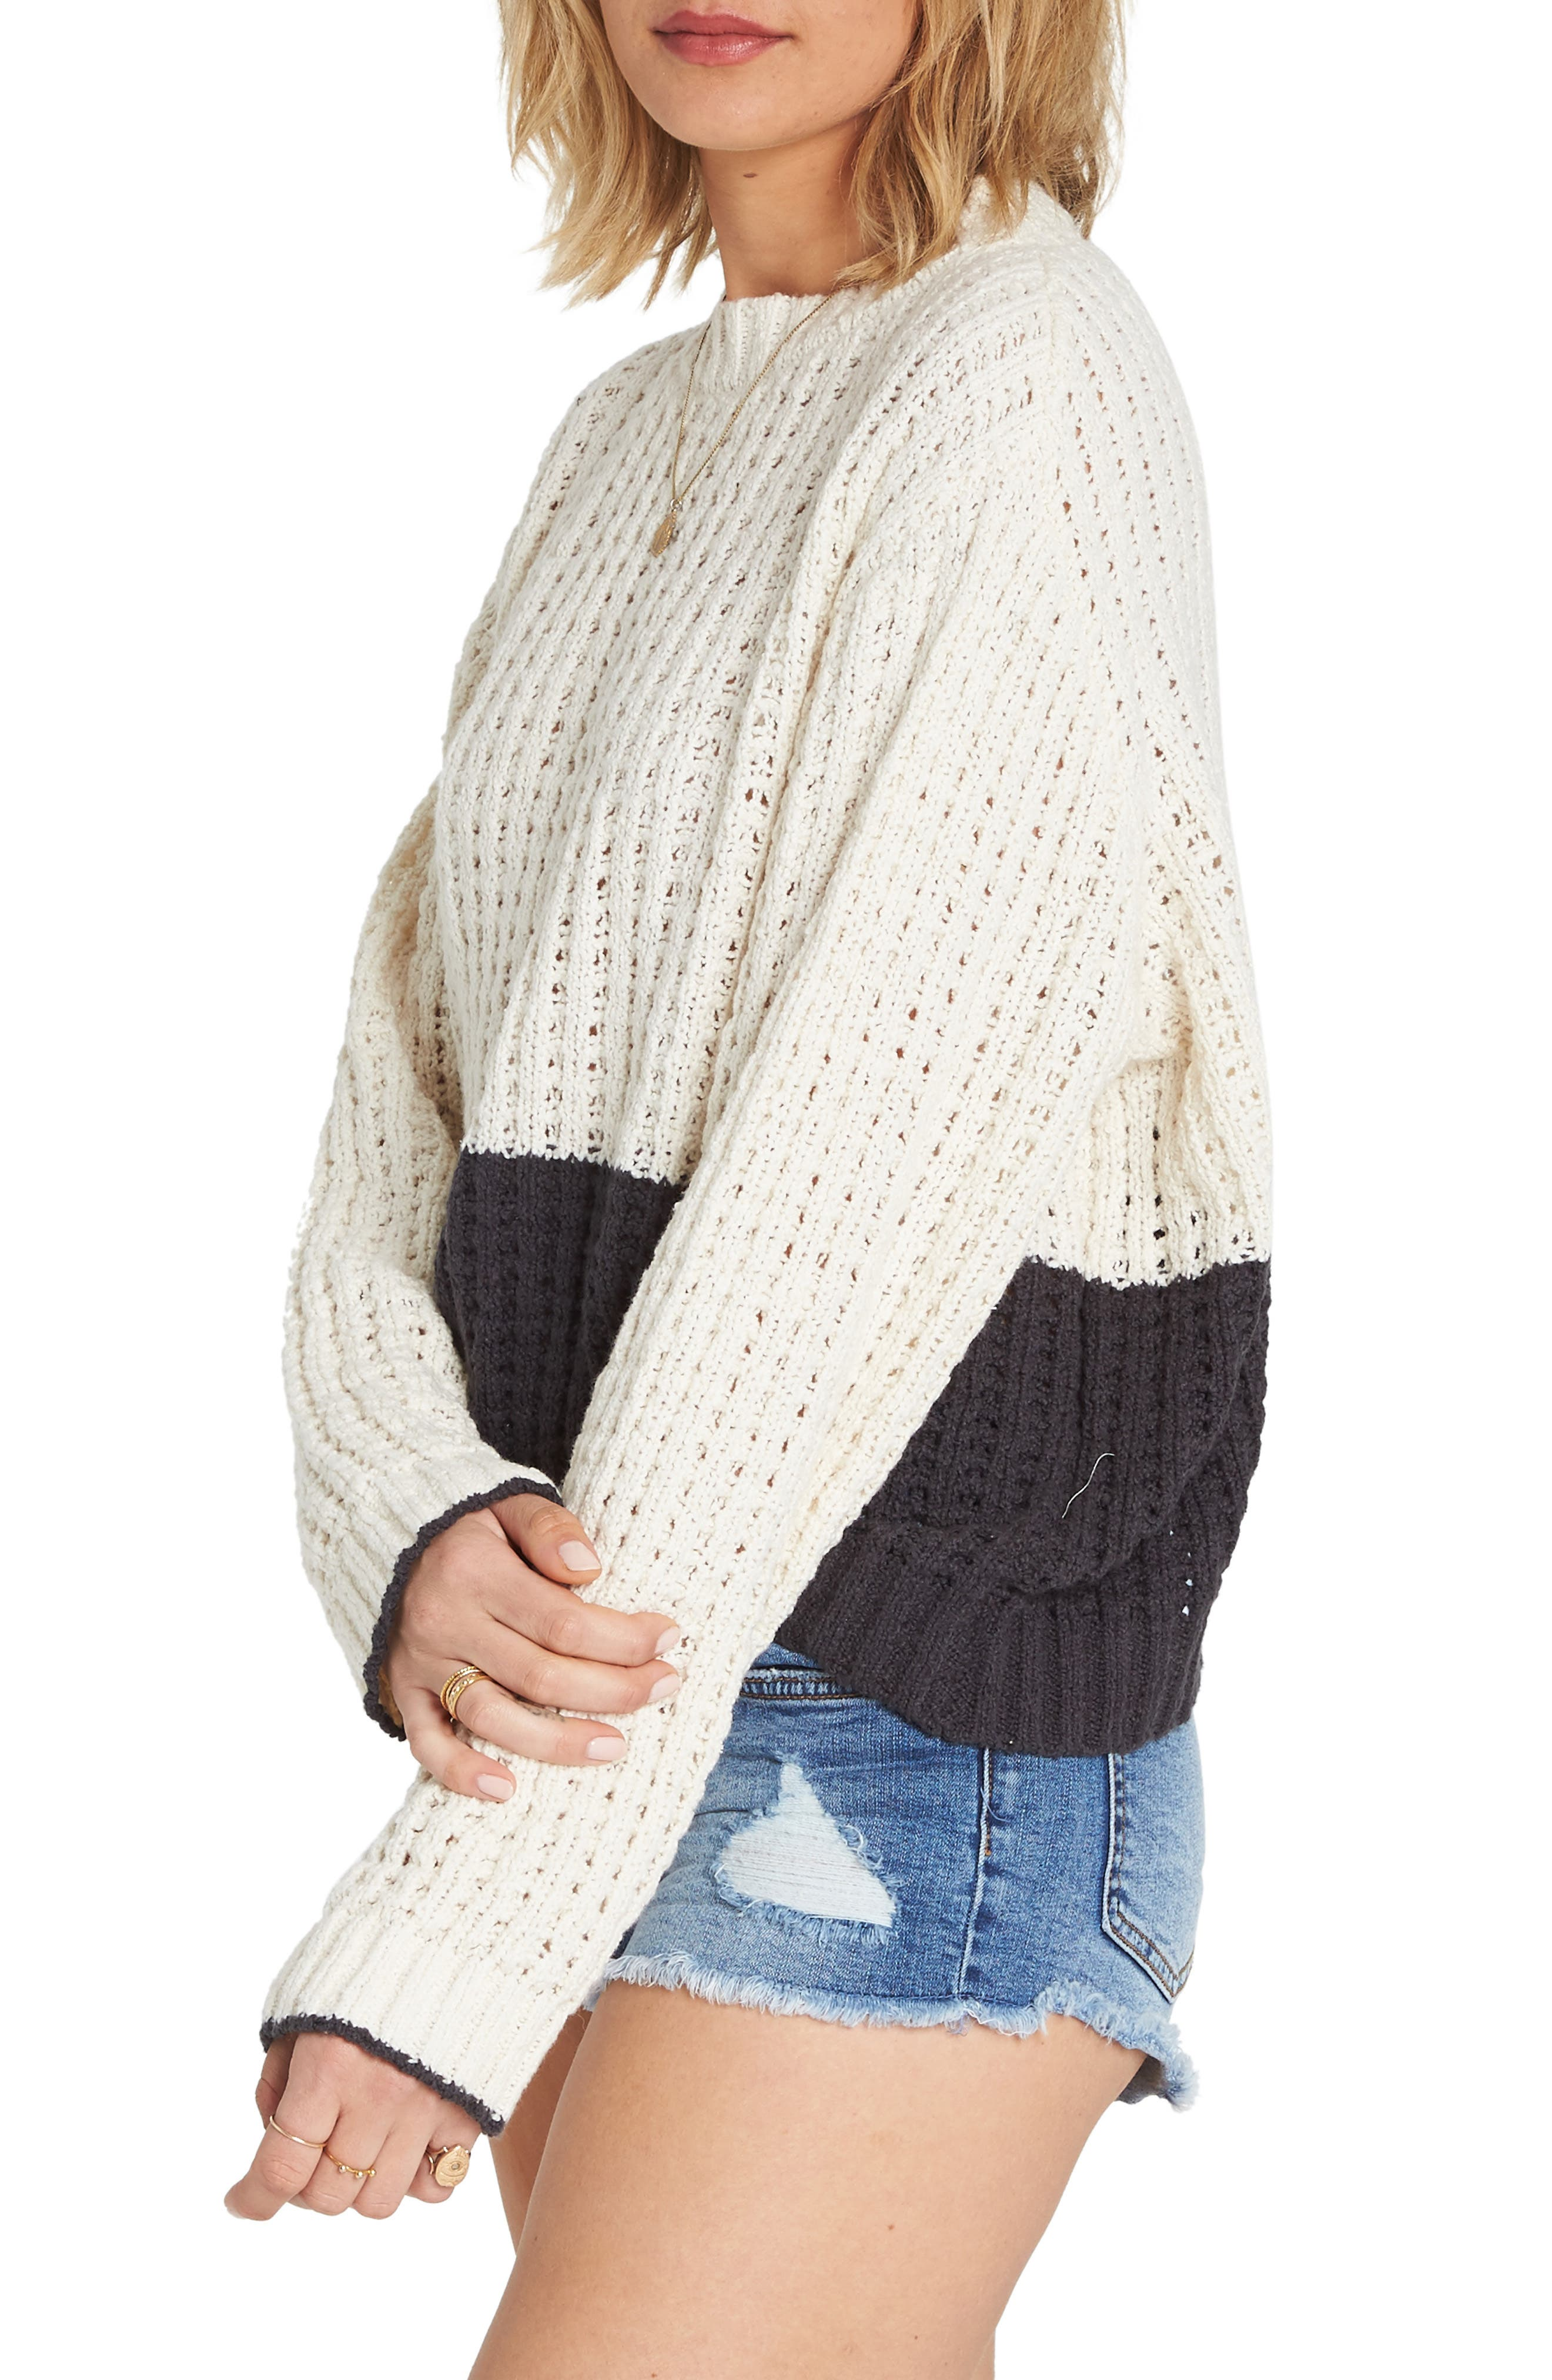 BILLABONG, Block Party Colorblock Sweater, Alternate thumbnail 3, color, 001